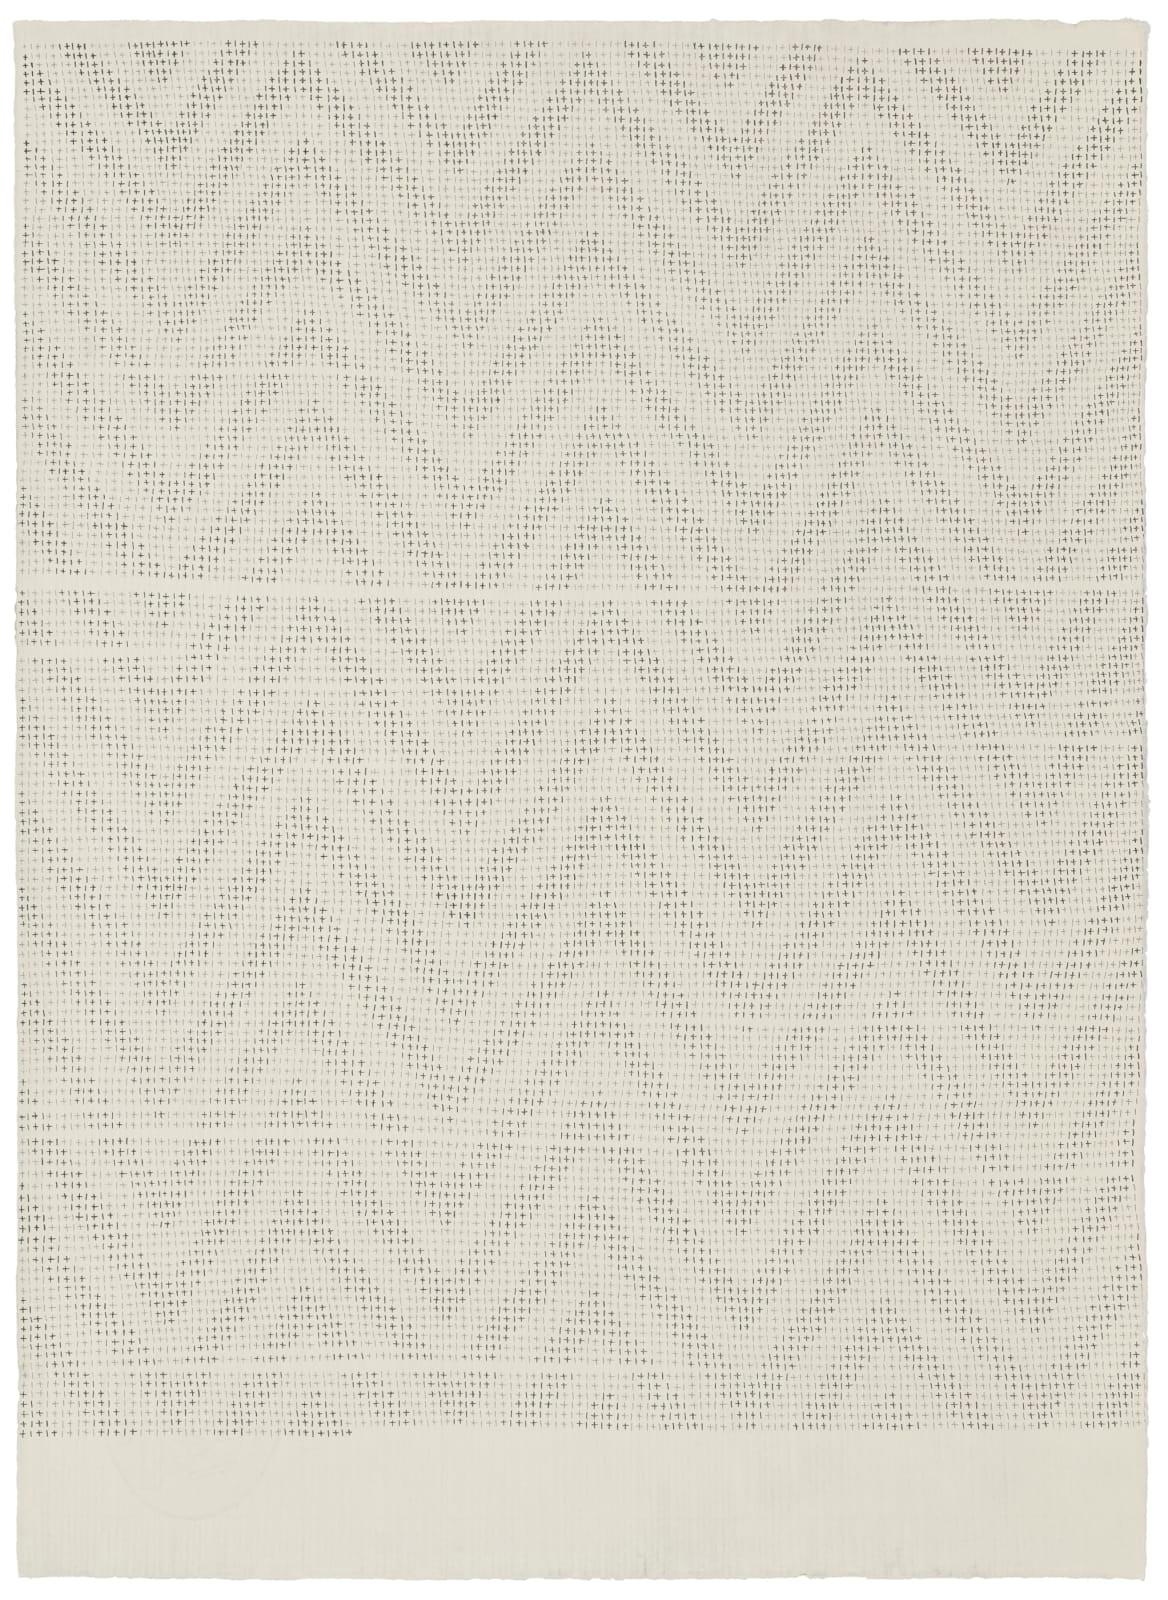 061217, 2017 Pencil on handmade cotton paper (Fabriano Roma), 66 x 48 cm | 26 x 18 7/8 in